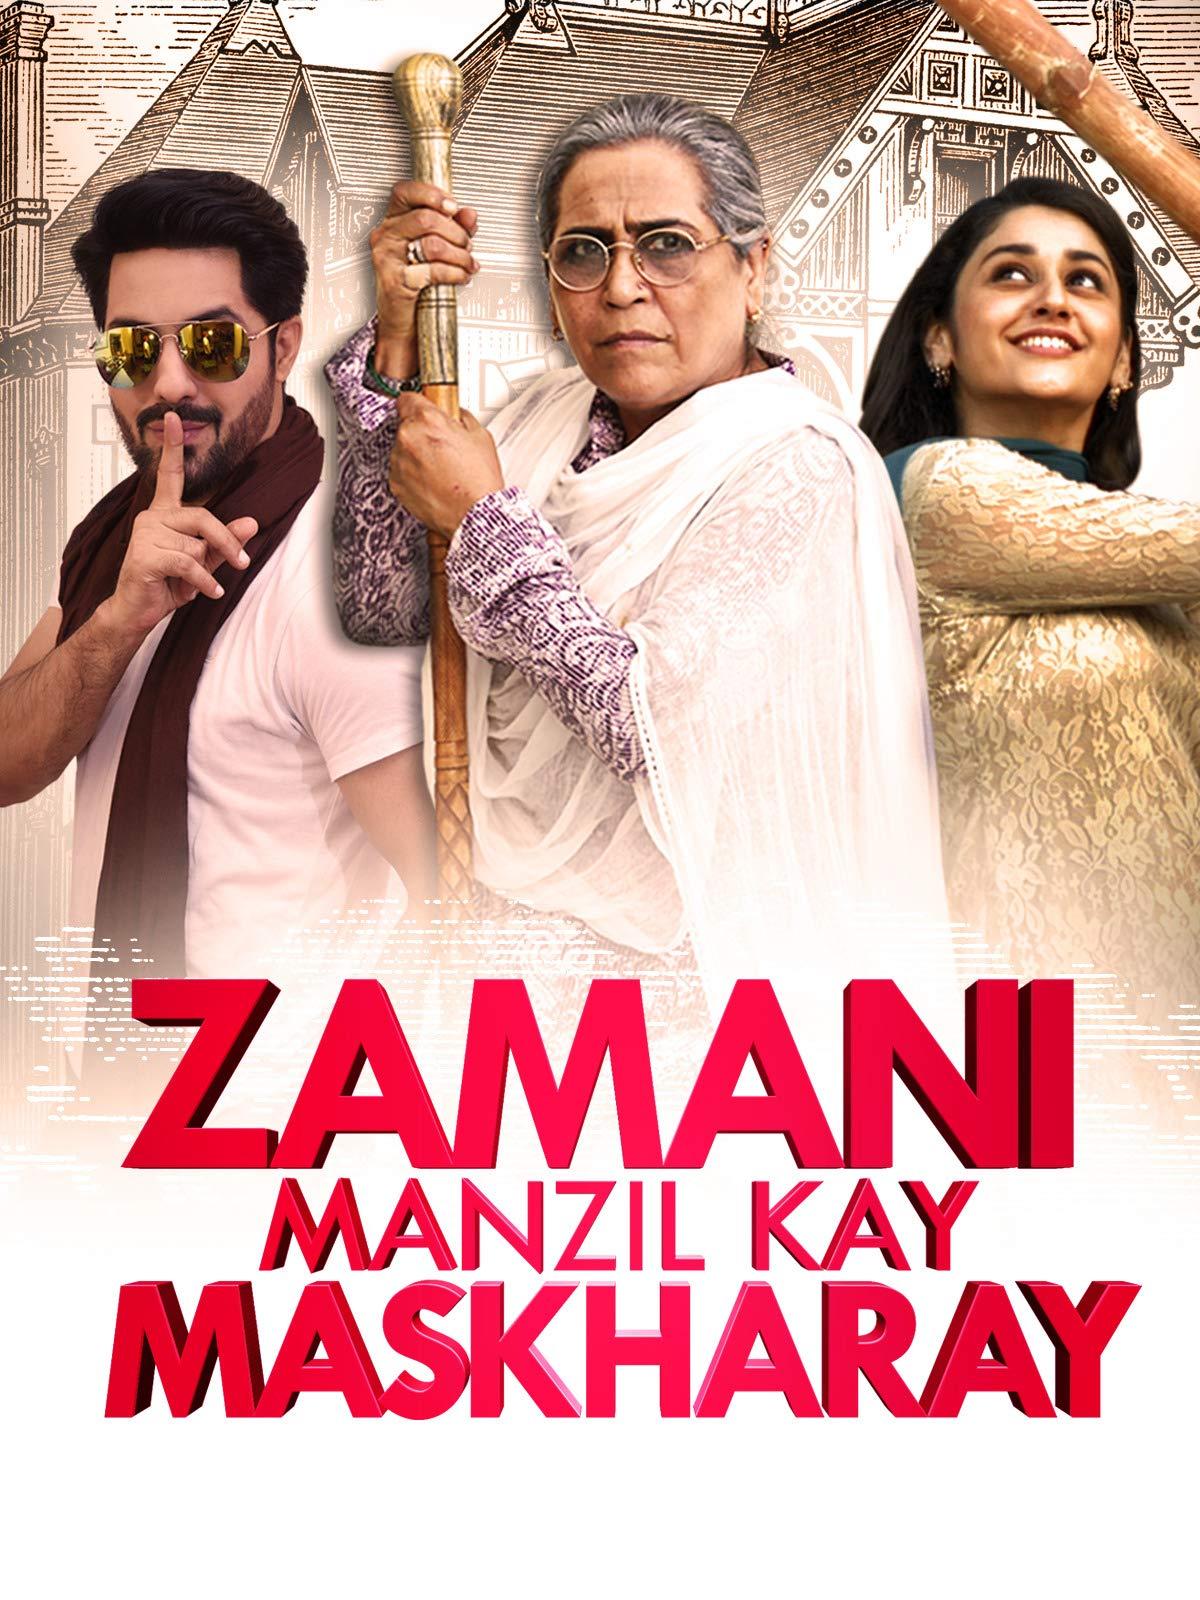 Zamani Manzil Kay Maskharay